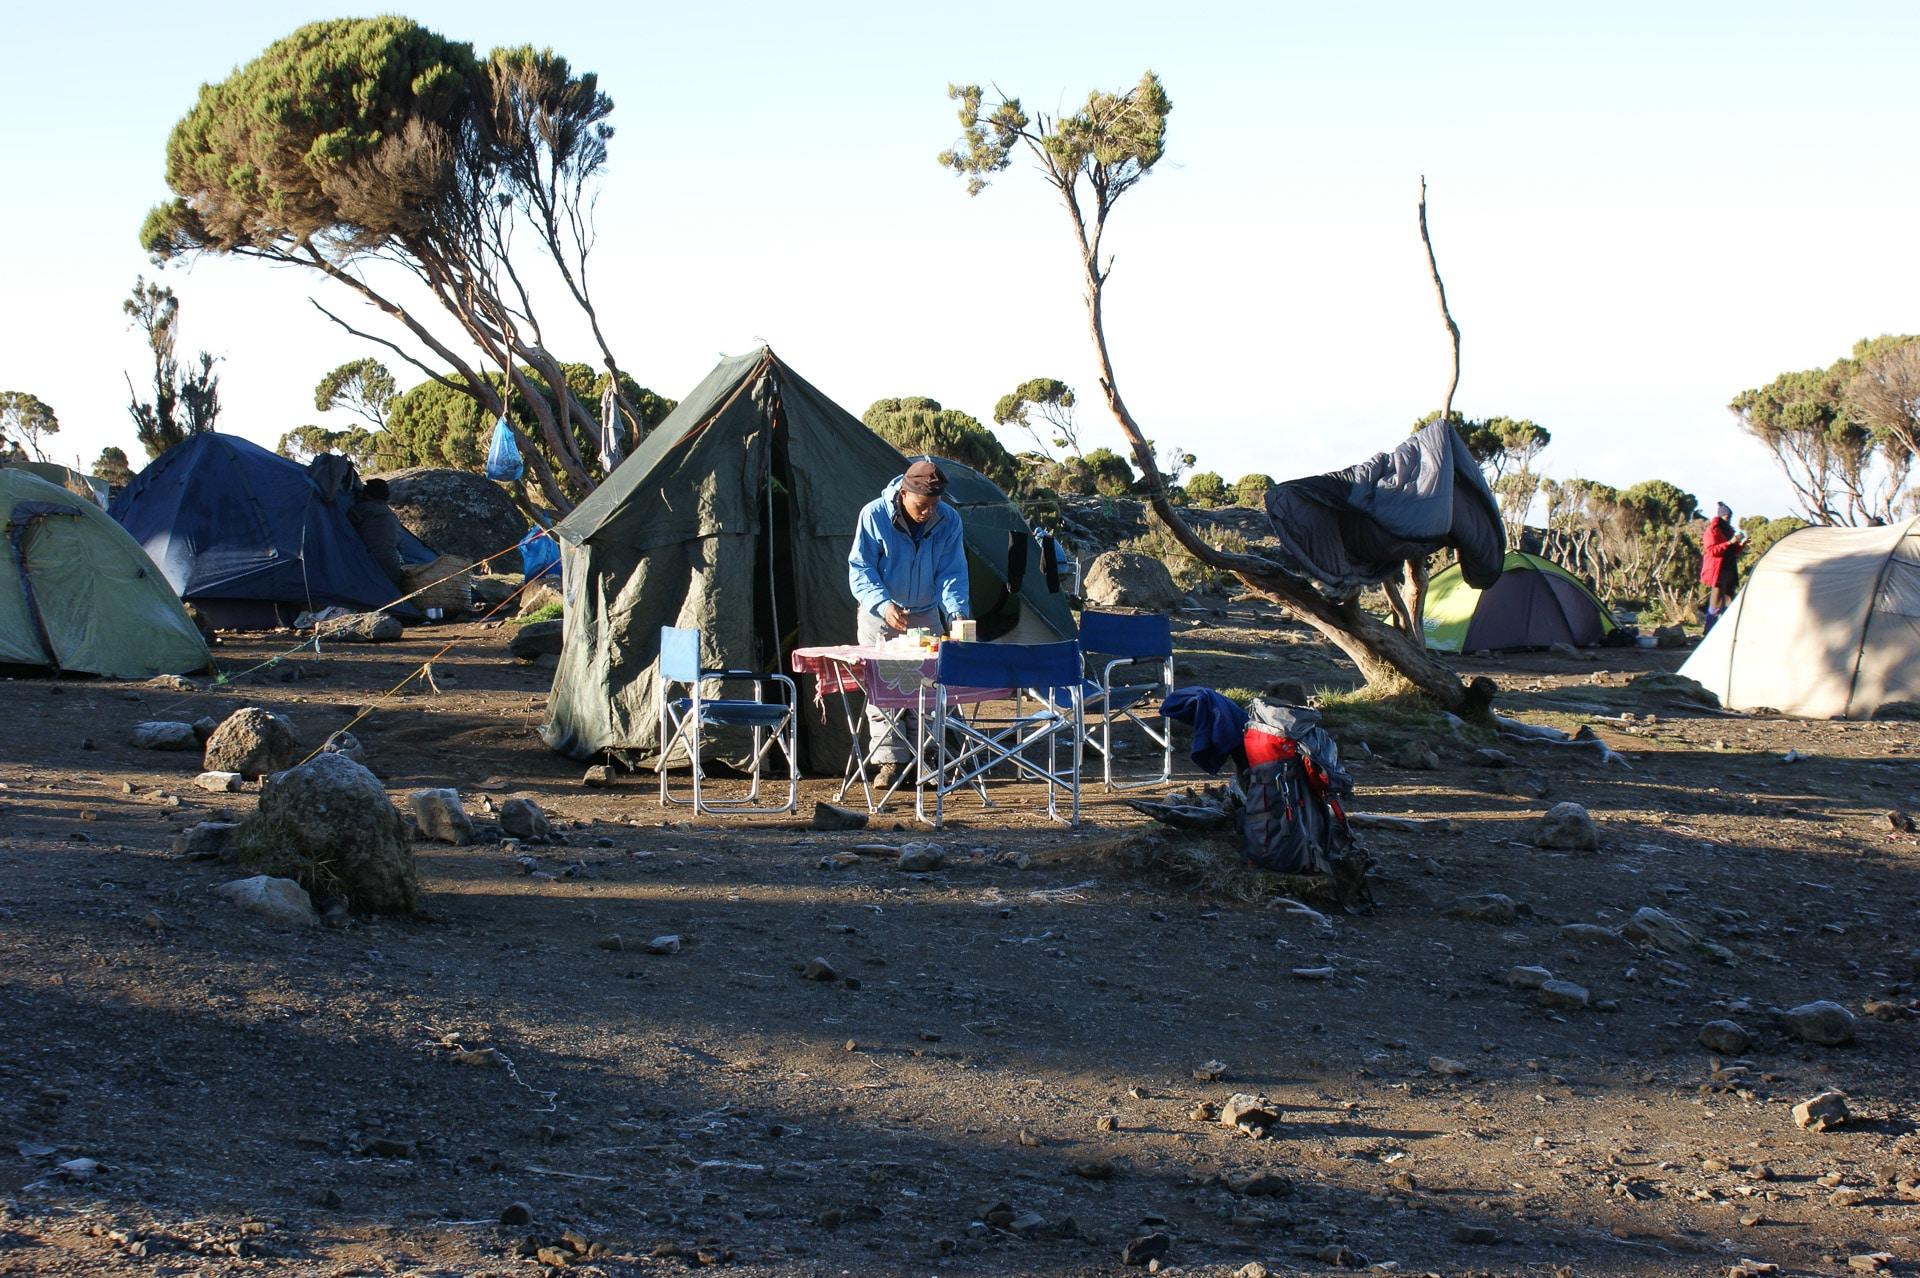 Kilimanjaro-Tansania-Globetrotter-Select-Krause-03